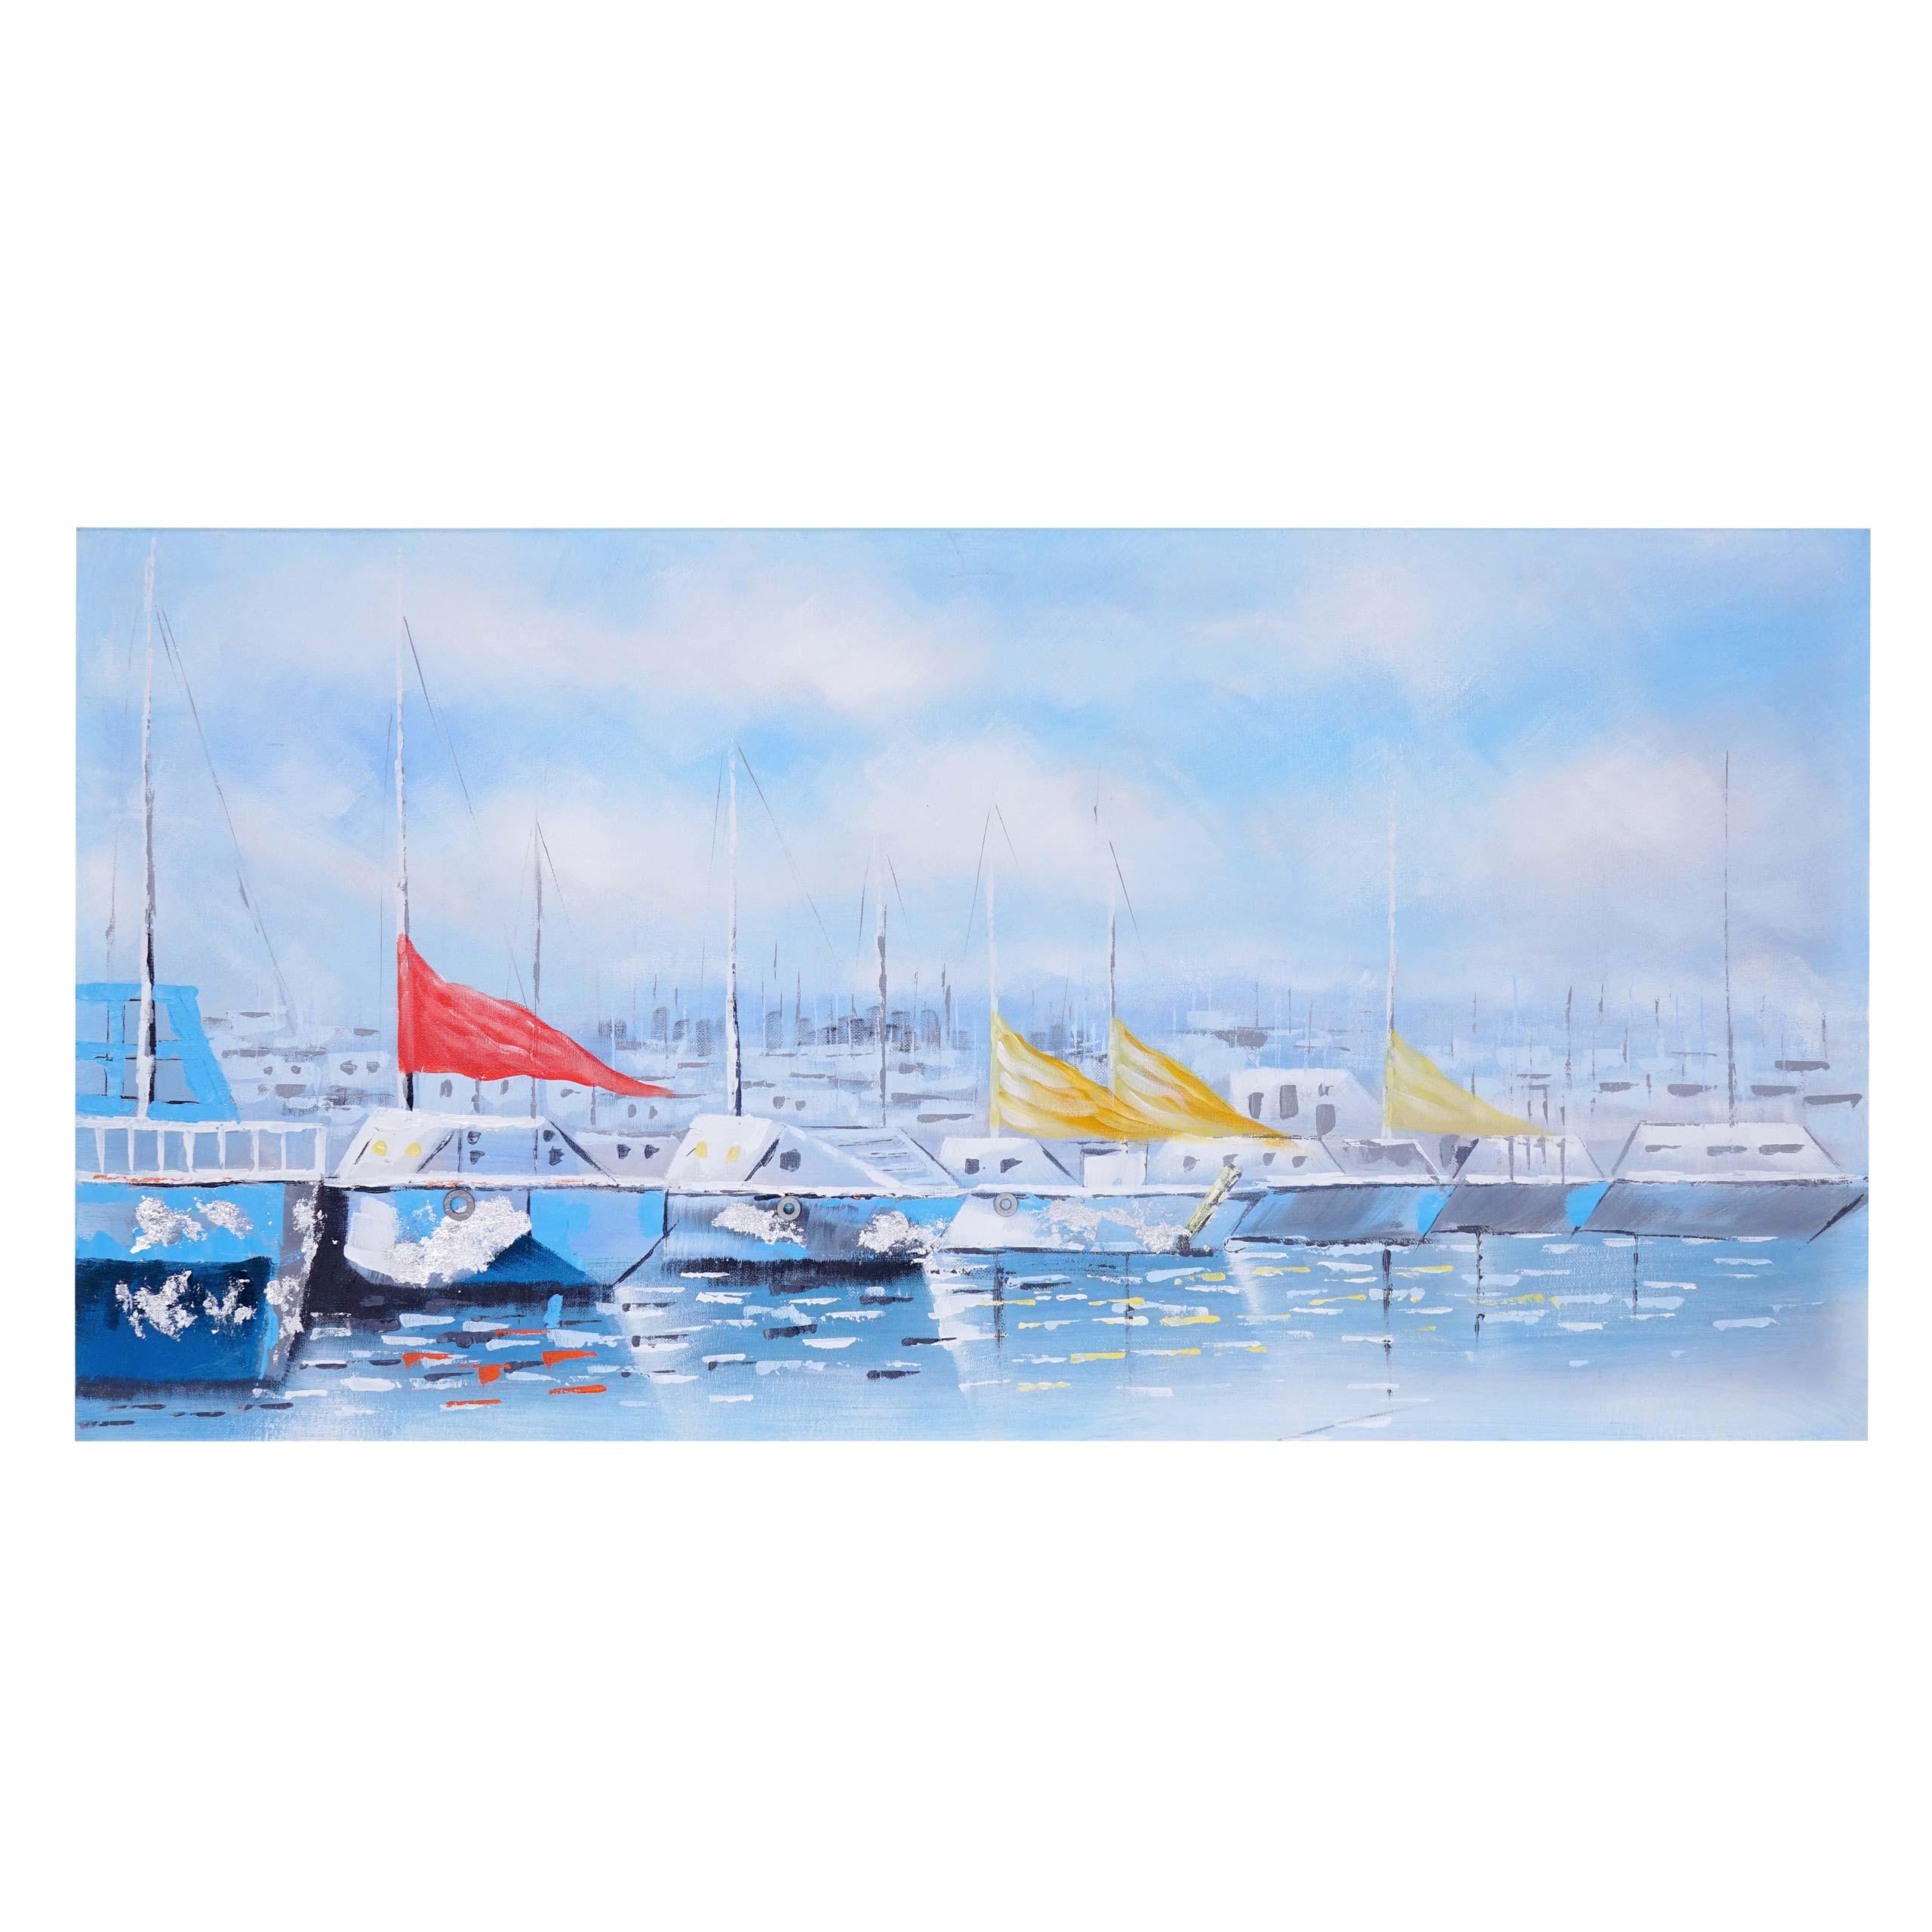 Mendler Ölgemälde Boote, 100% handgemaltes Wandbild Gemälde XL, 140x70cm ~ Variantenangebot 59449